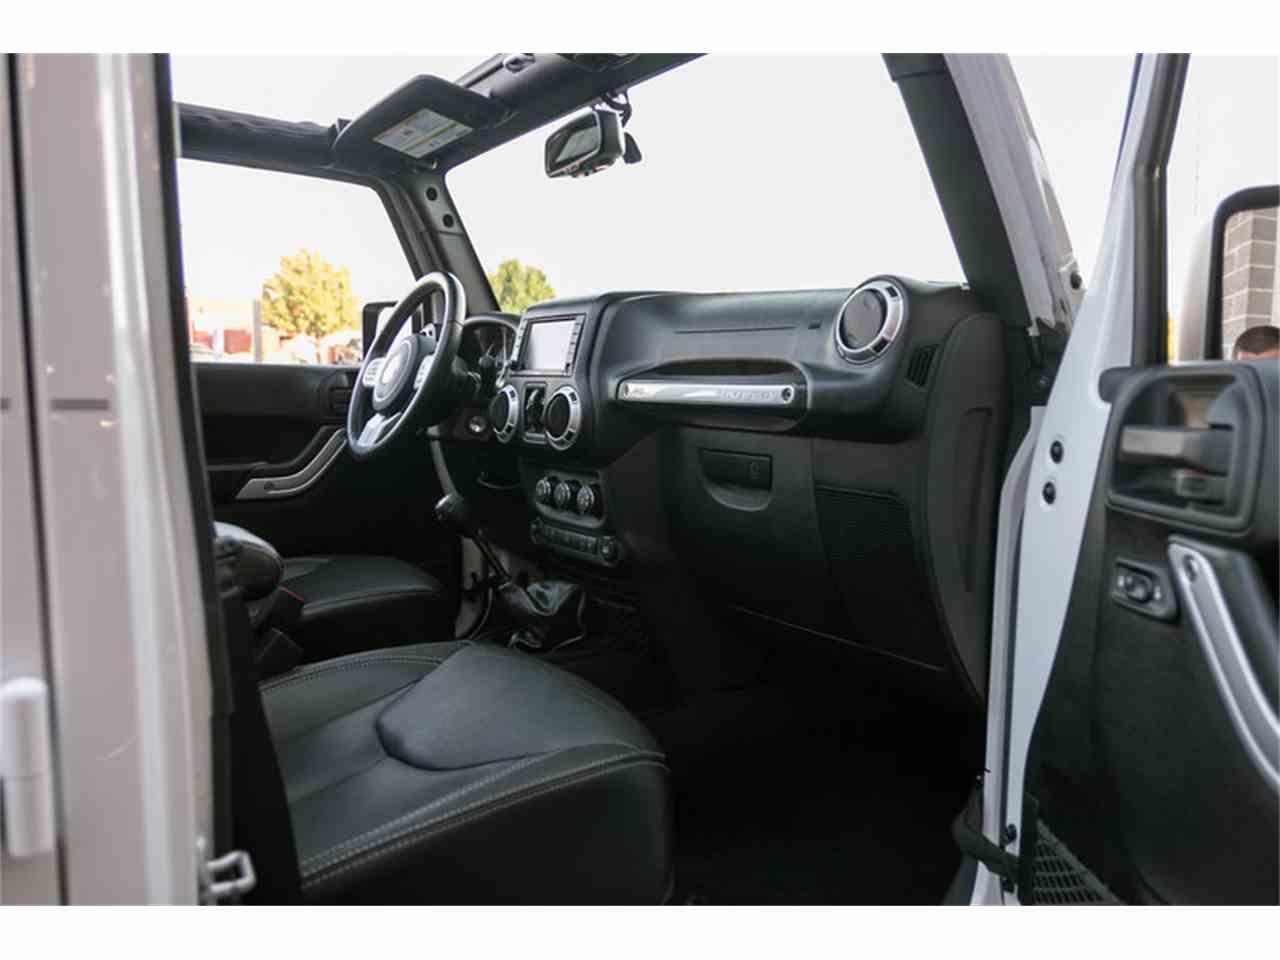 Large Picture of 2015 Jeep Wrangler located in Missouri - $29,995.00 - M4VI